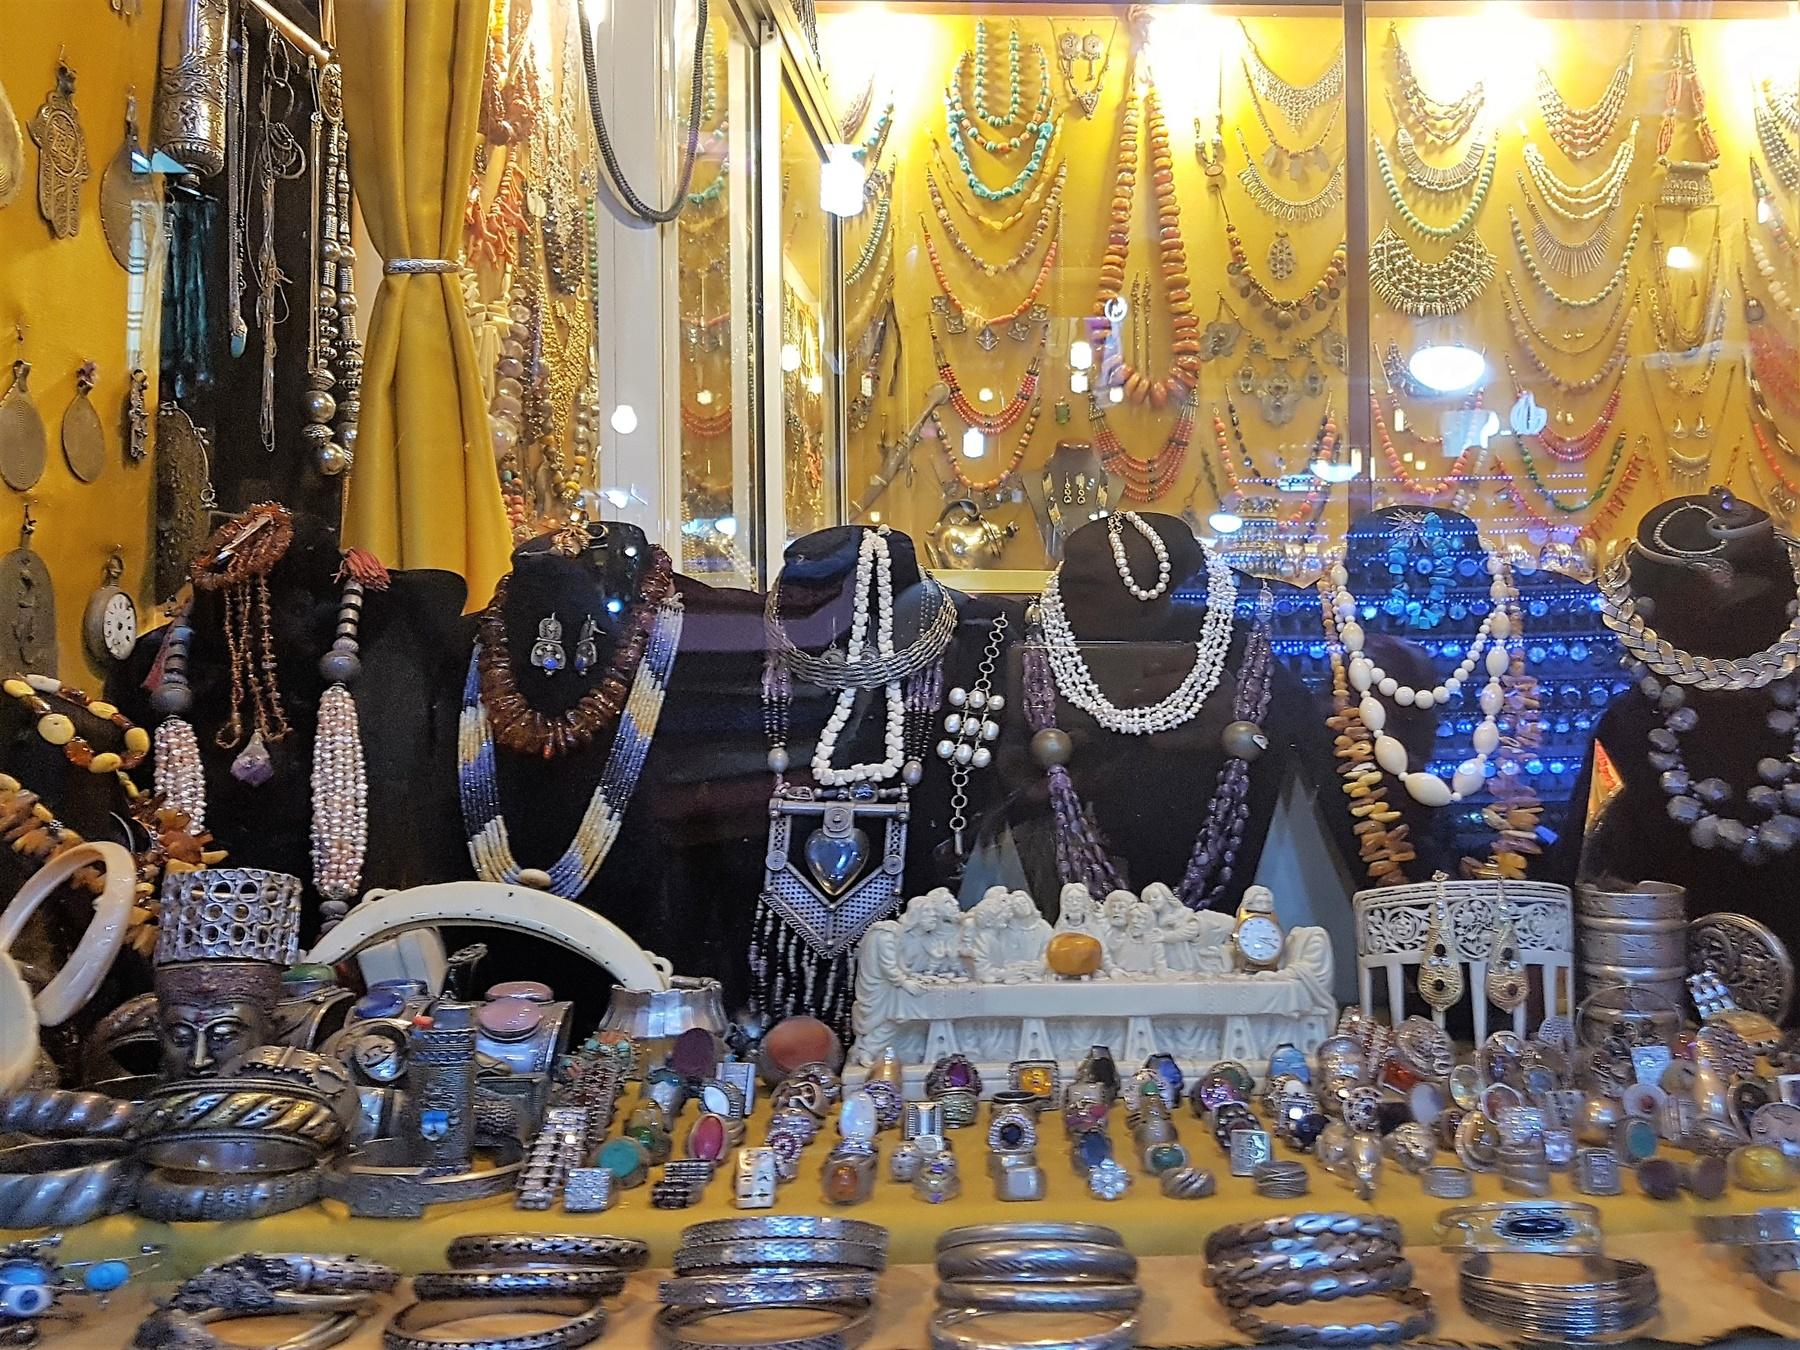 The Jewelers' Souk